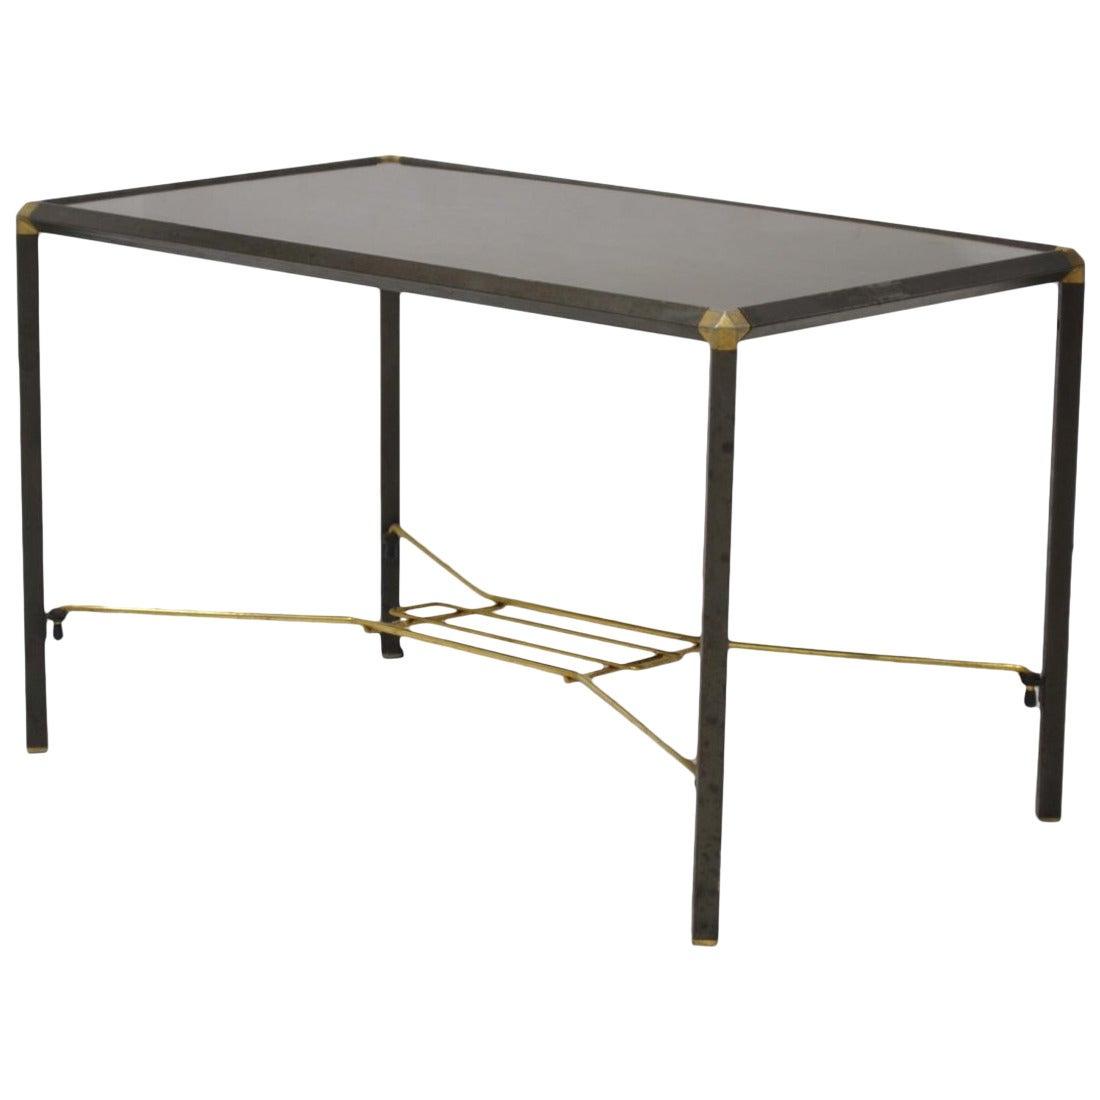 Italian Wood And Steel Coffee Table At 1stdibs